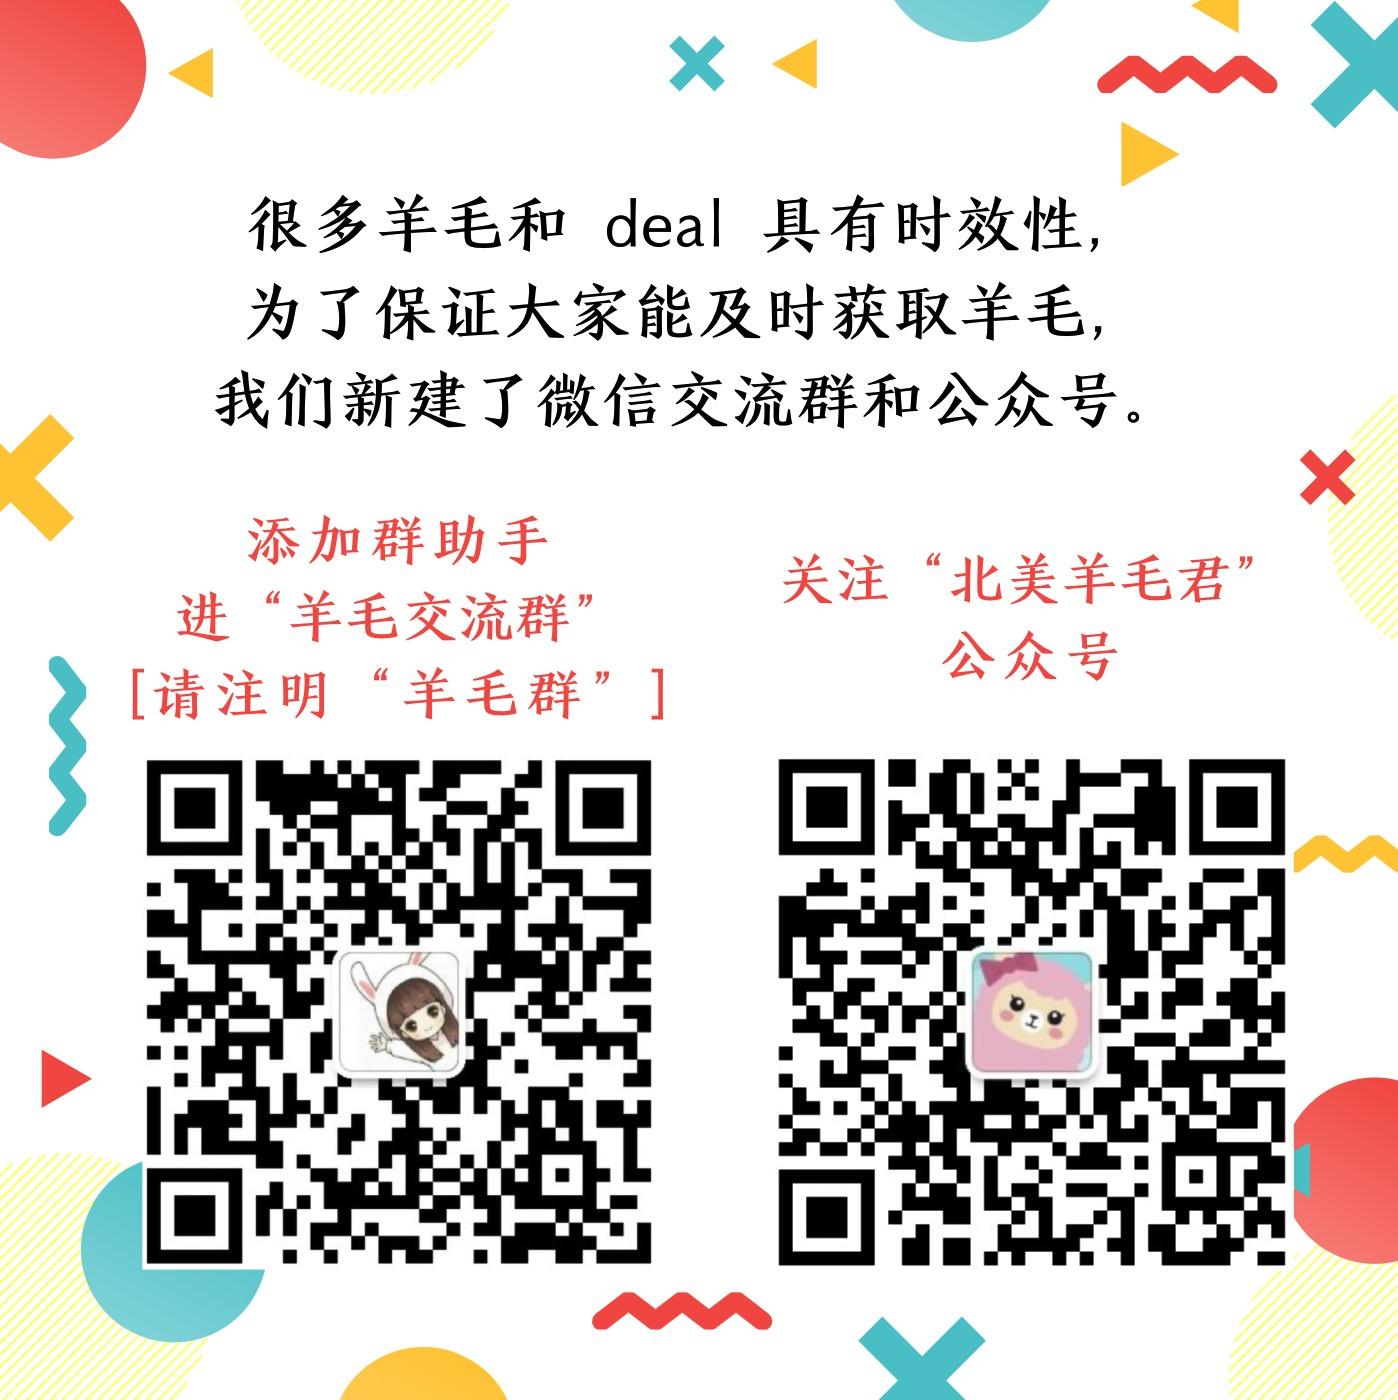 group QR code